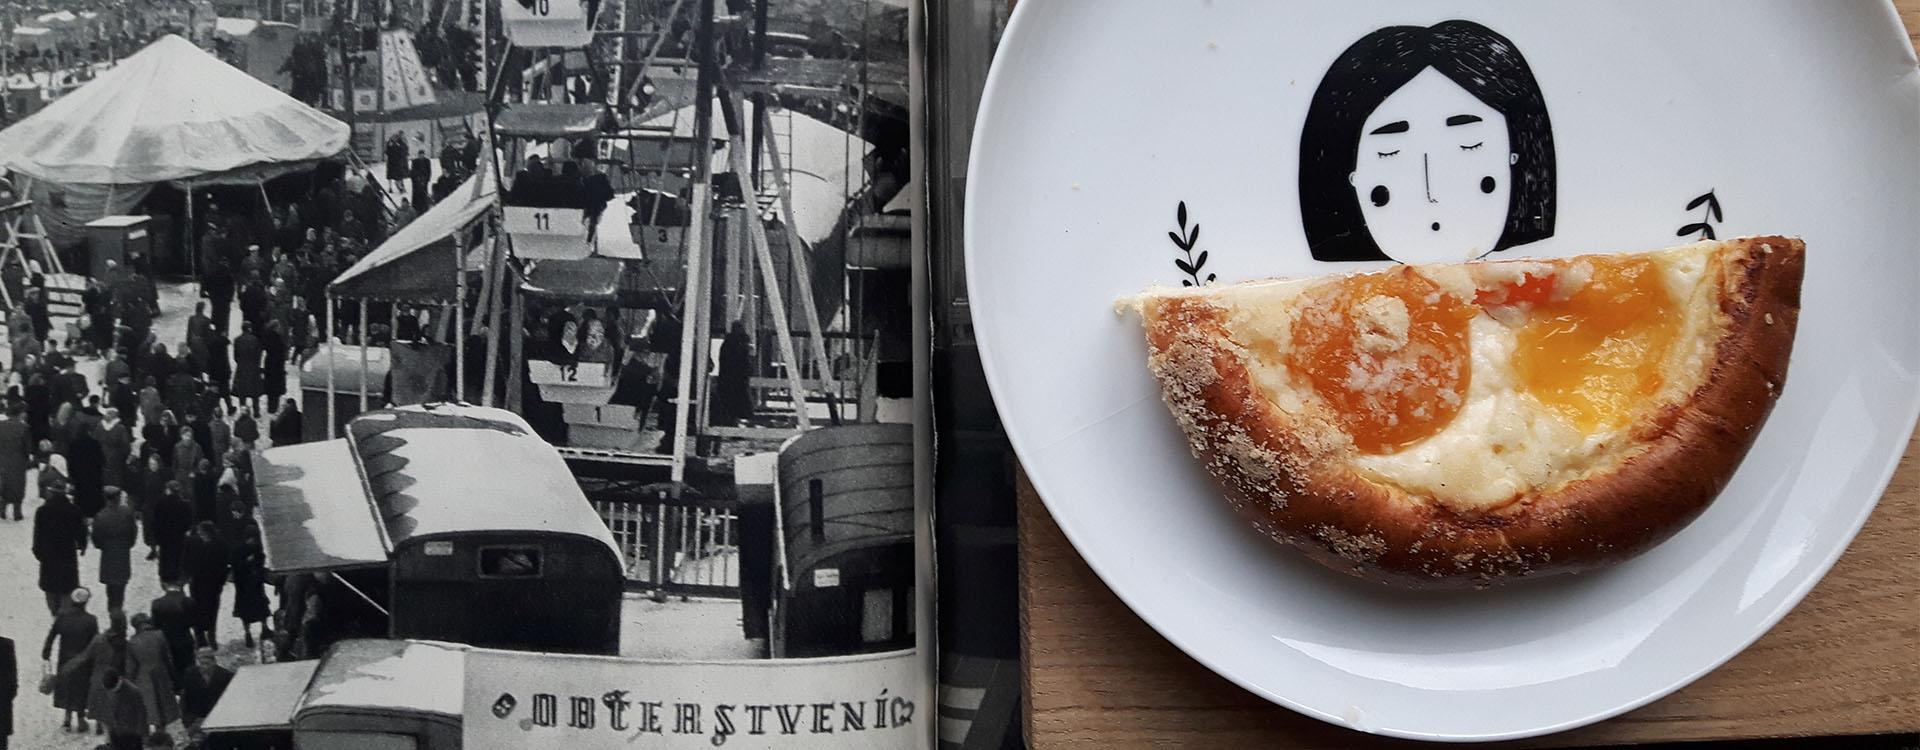 Alt-Böhmische Bäckerei